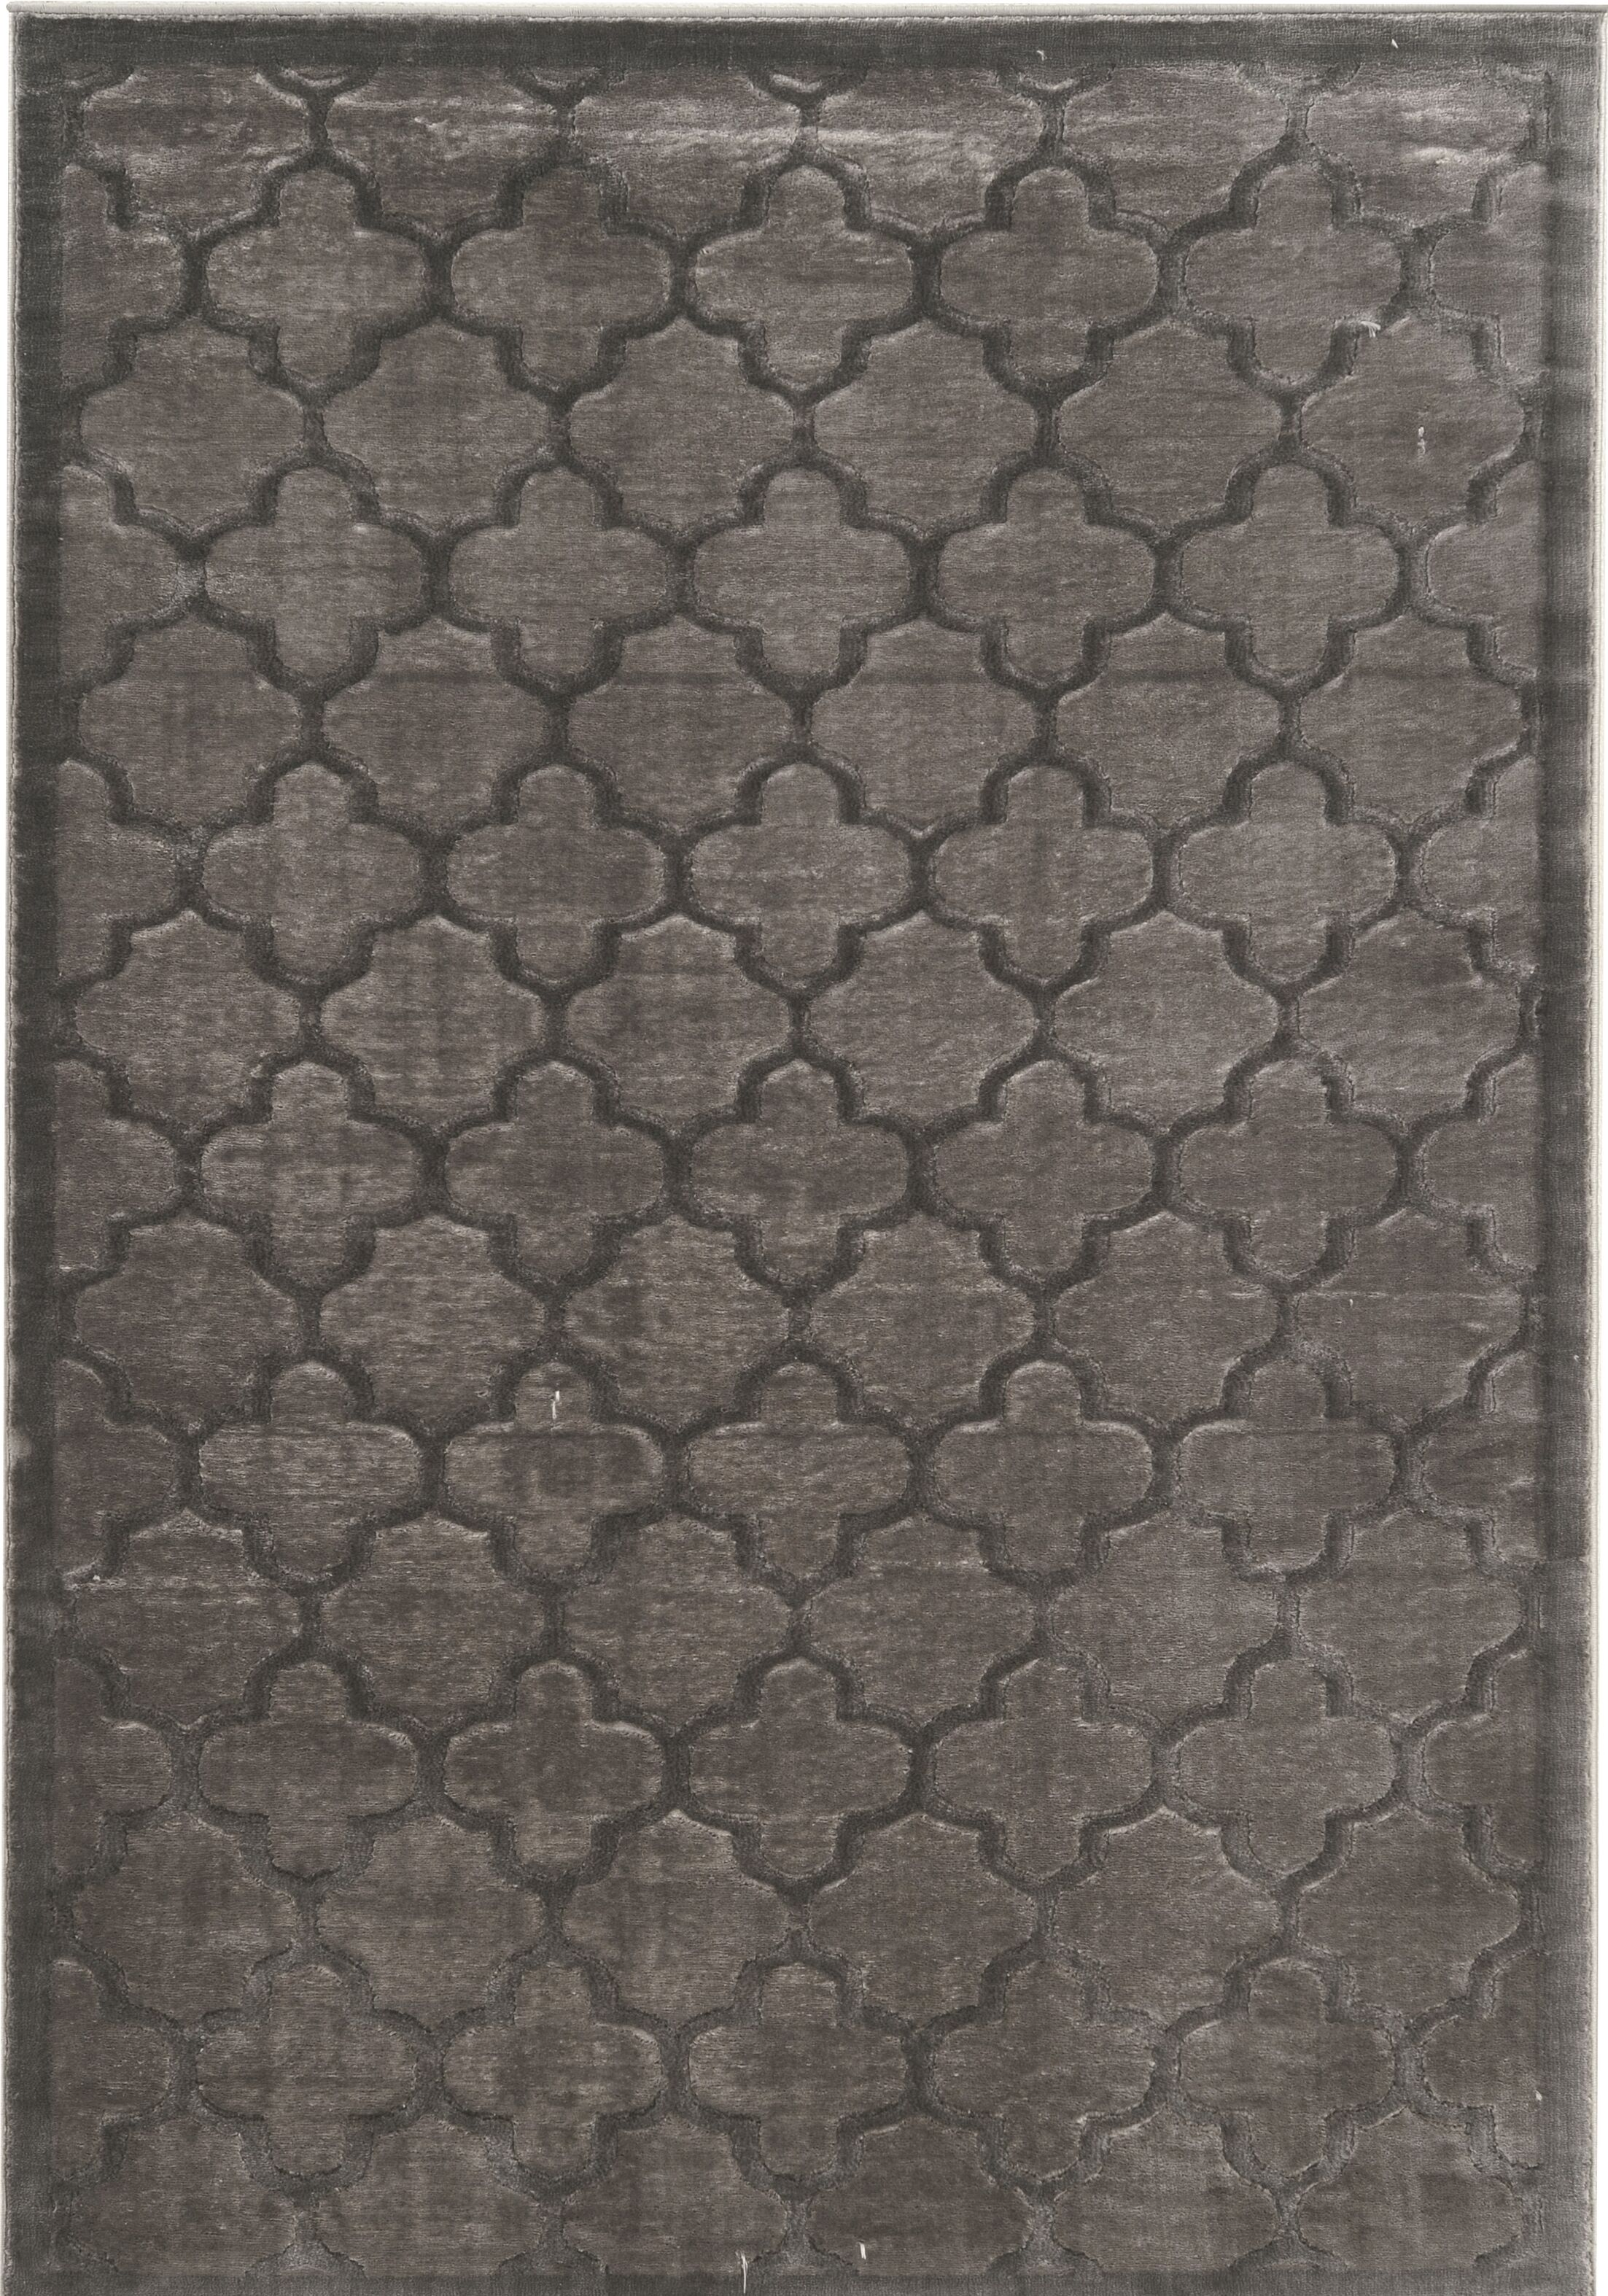 Belper Gray Area Rug Rug Size: Rectangle 8' x 11'